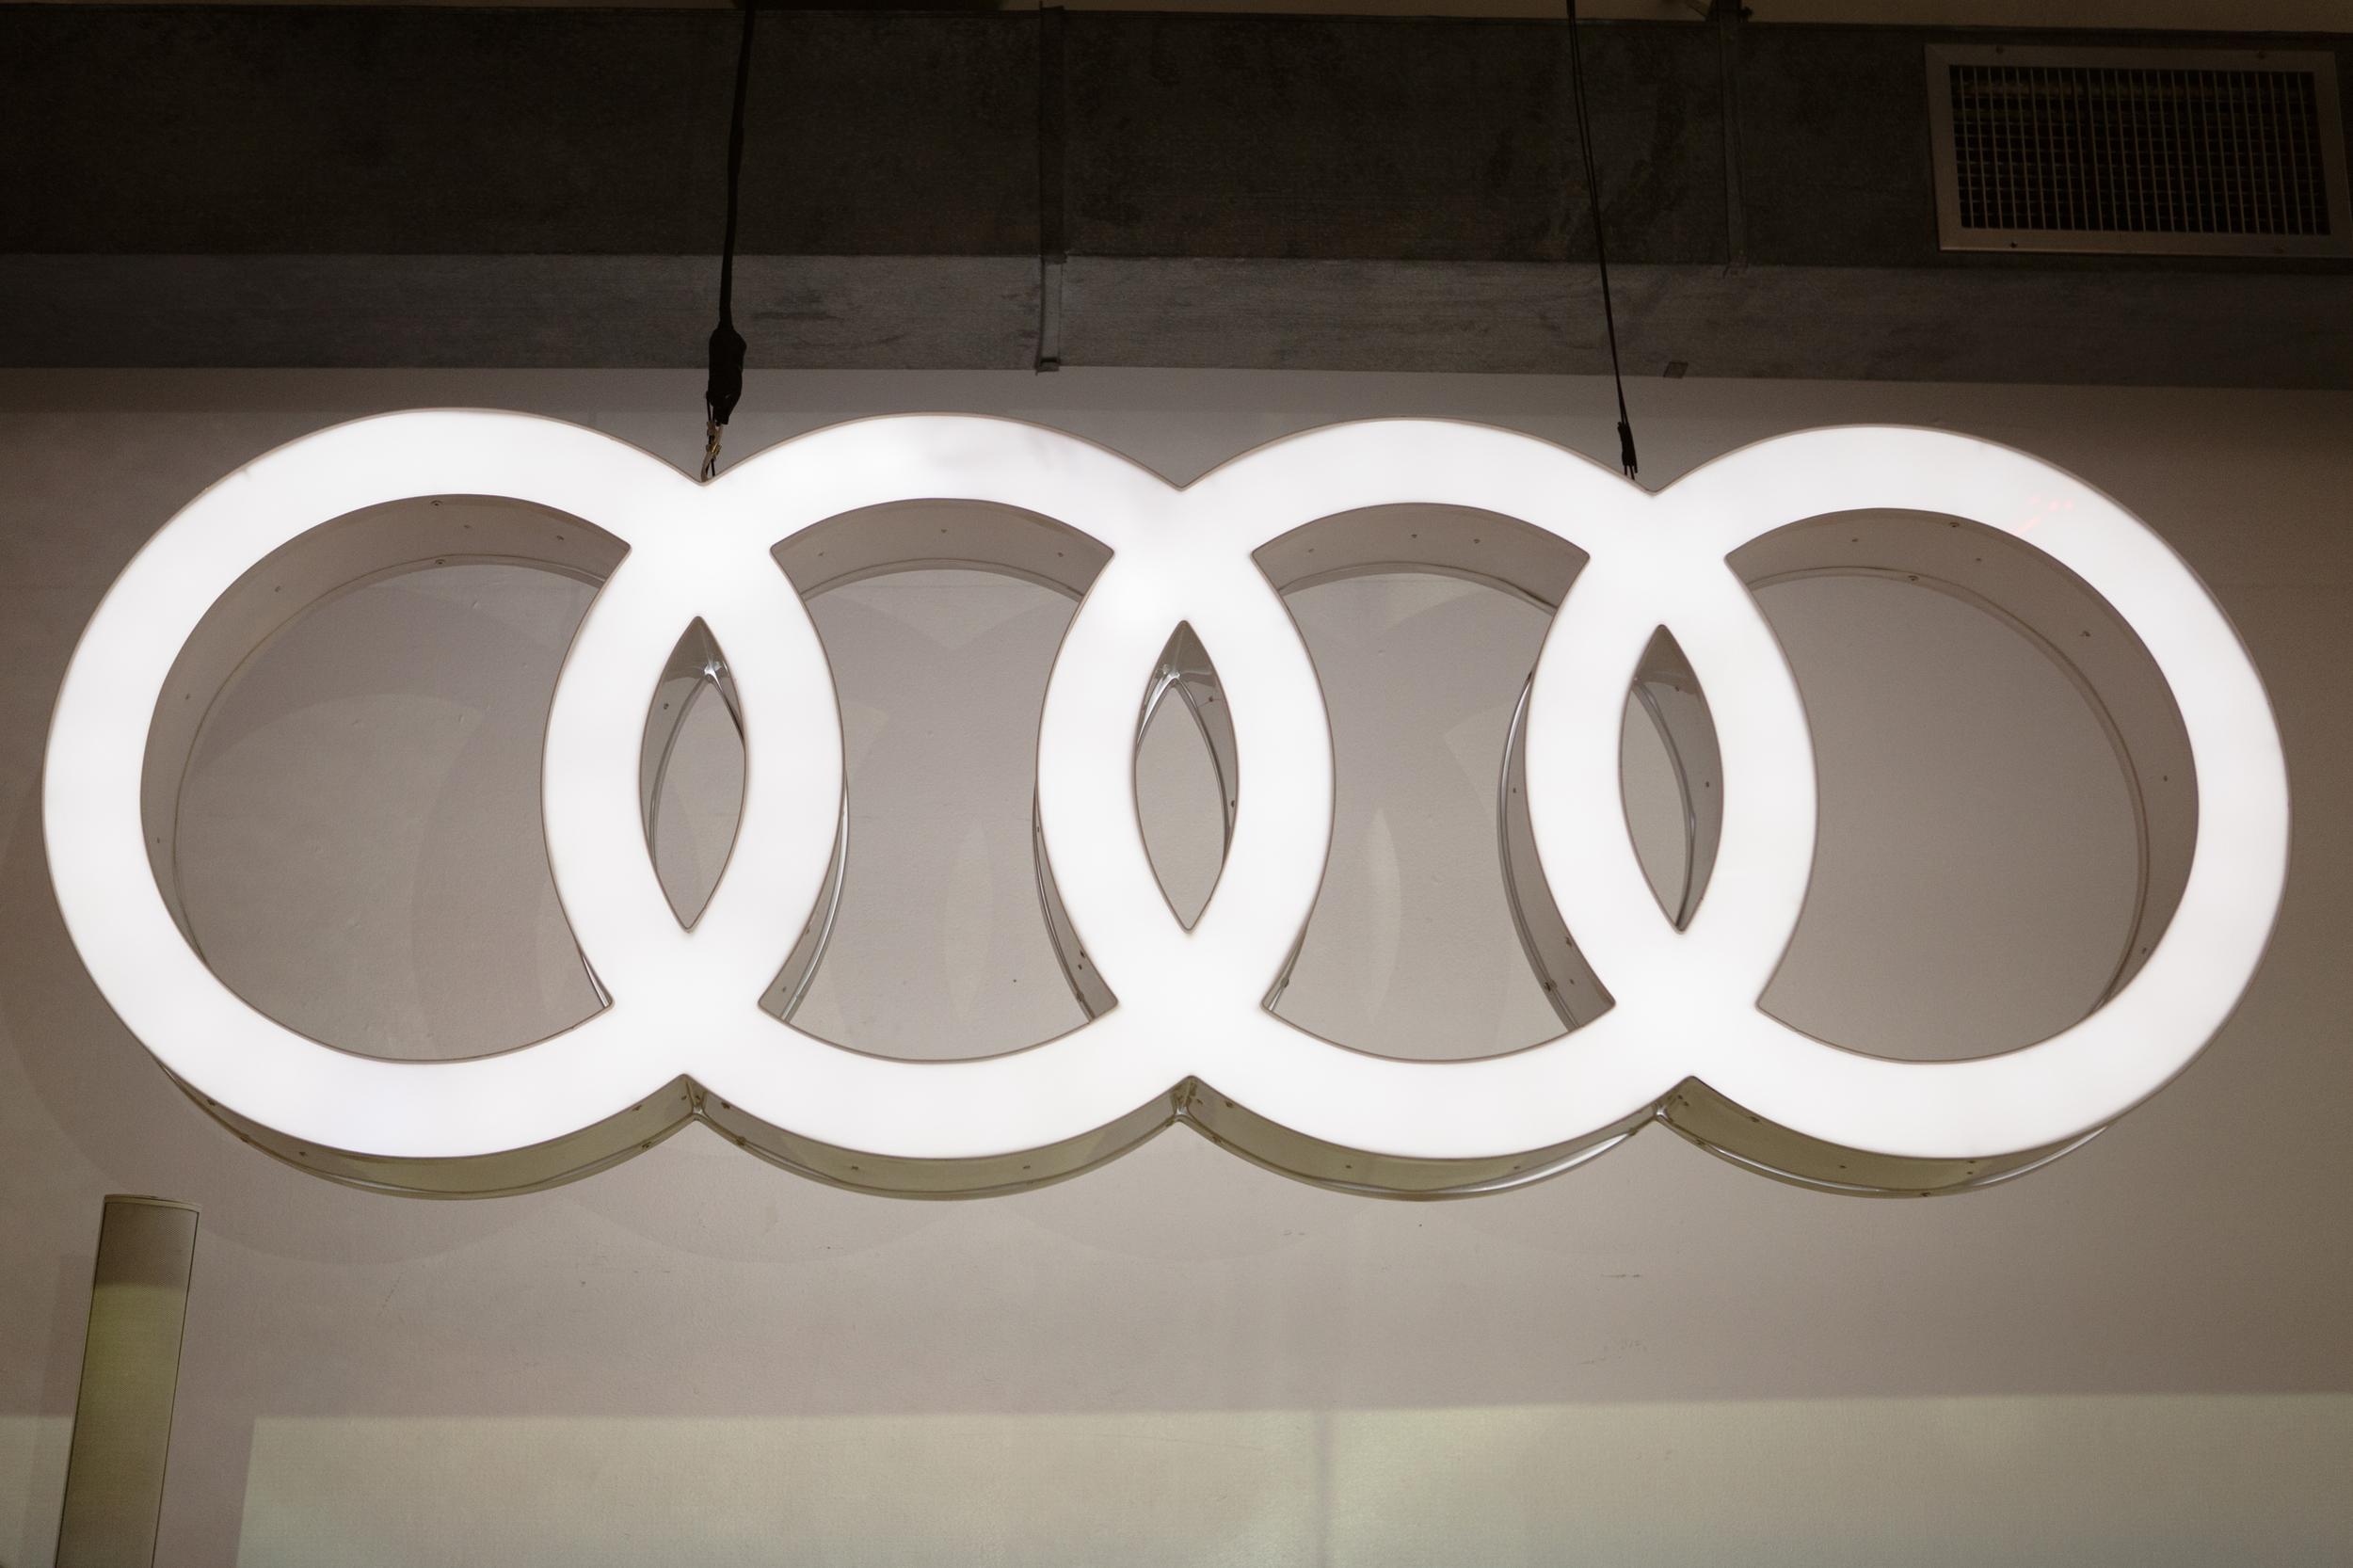 Audi-HD-53_B6A9018.jpg